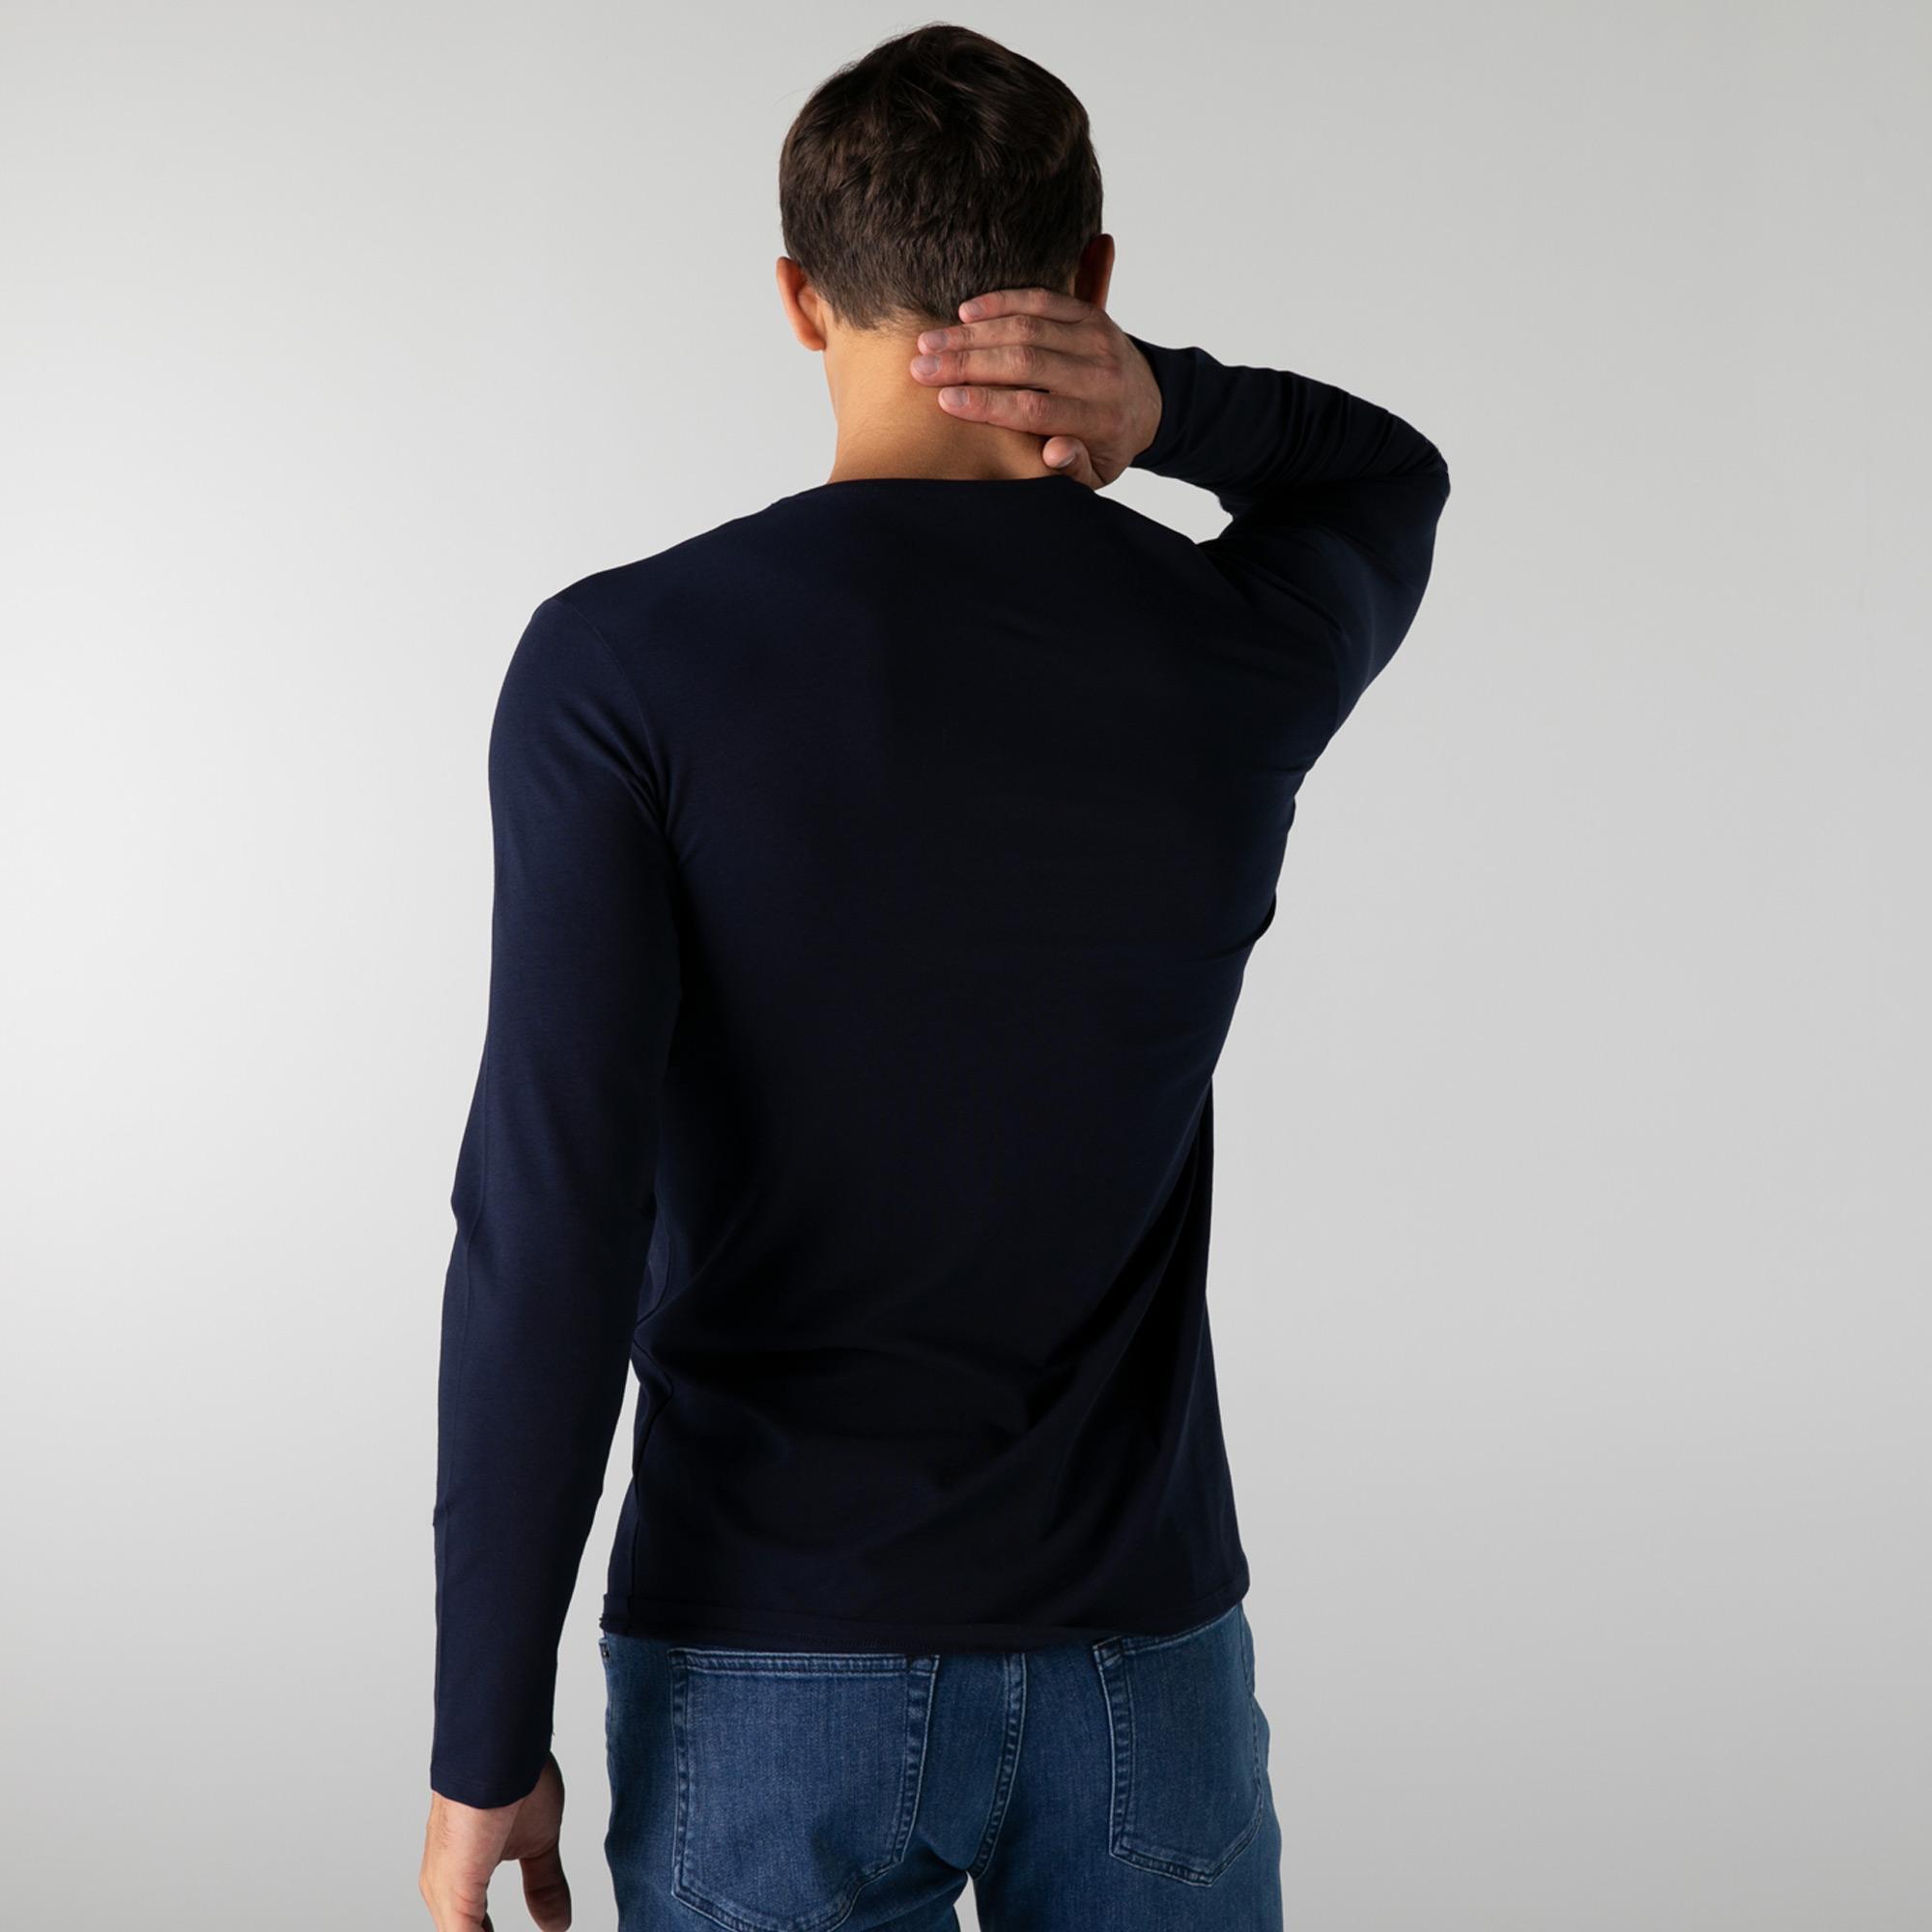 Lacoste Erkek Regular Fit Uzun Kollu V Yaka Lacivert T-Shirt